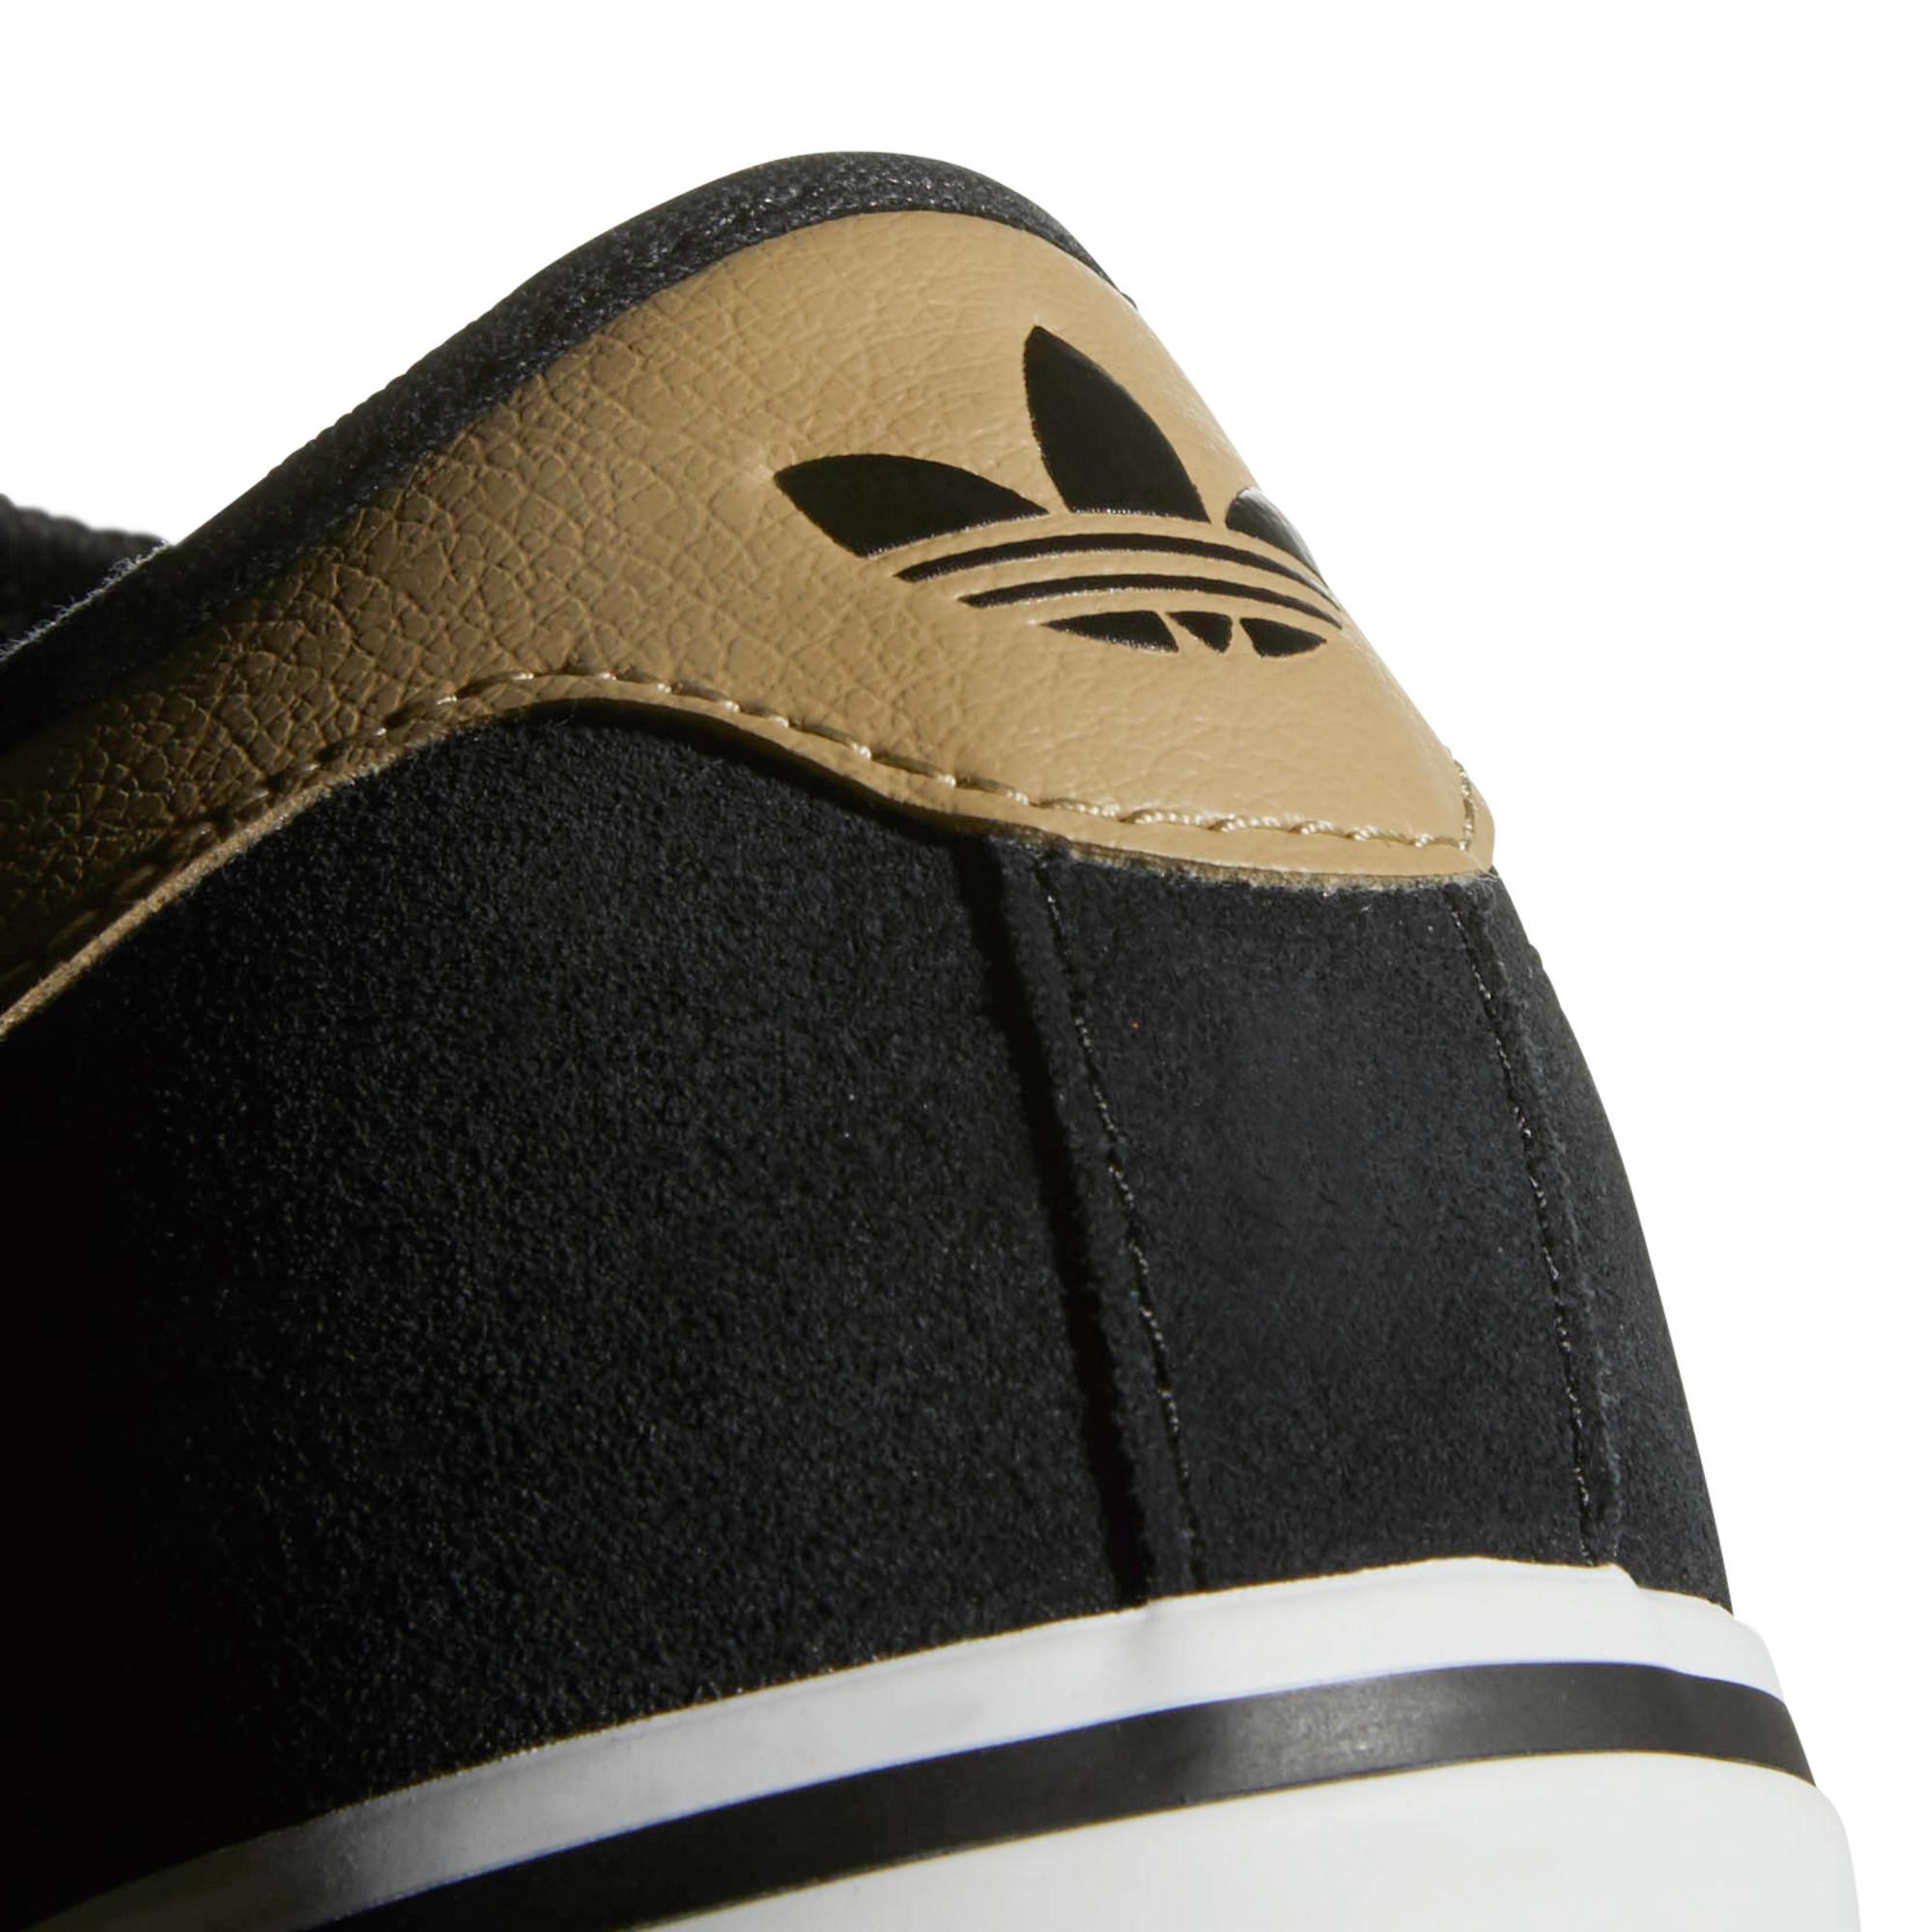 Adidas Skateboarding - - - Adi-Ease Premiere - Skate Chaussures, Trainers, Suede, 6ee458